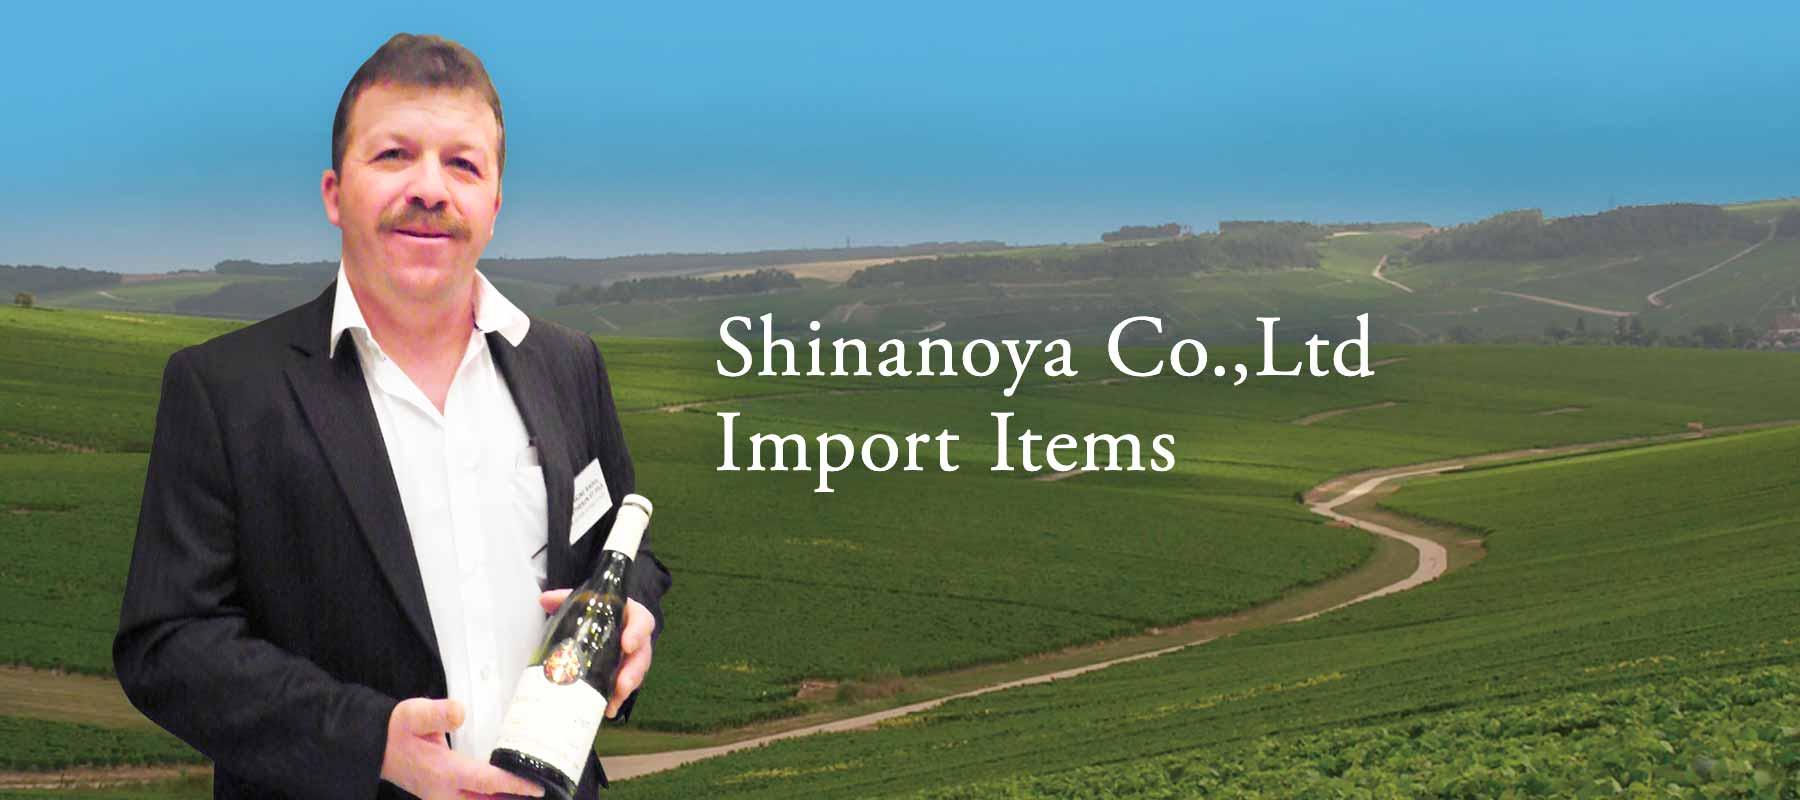 Shinanoya Co.,Ltd Import Items